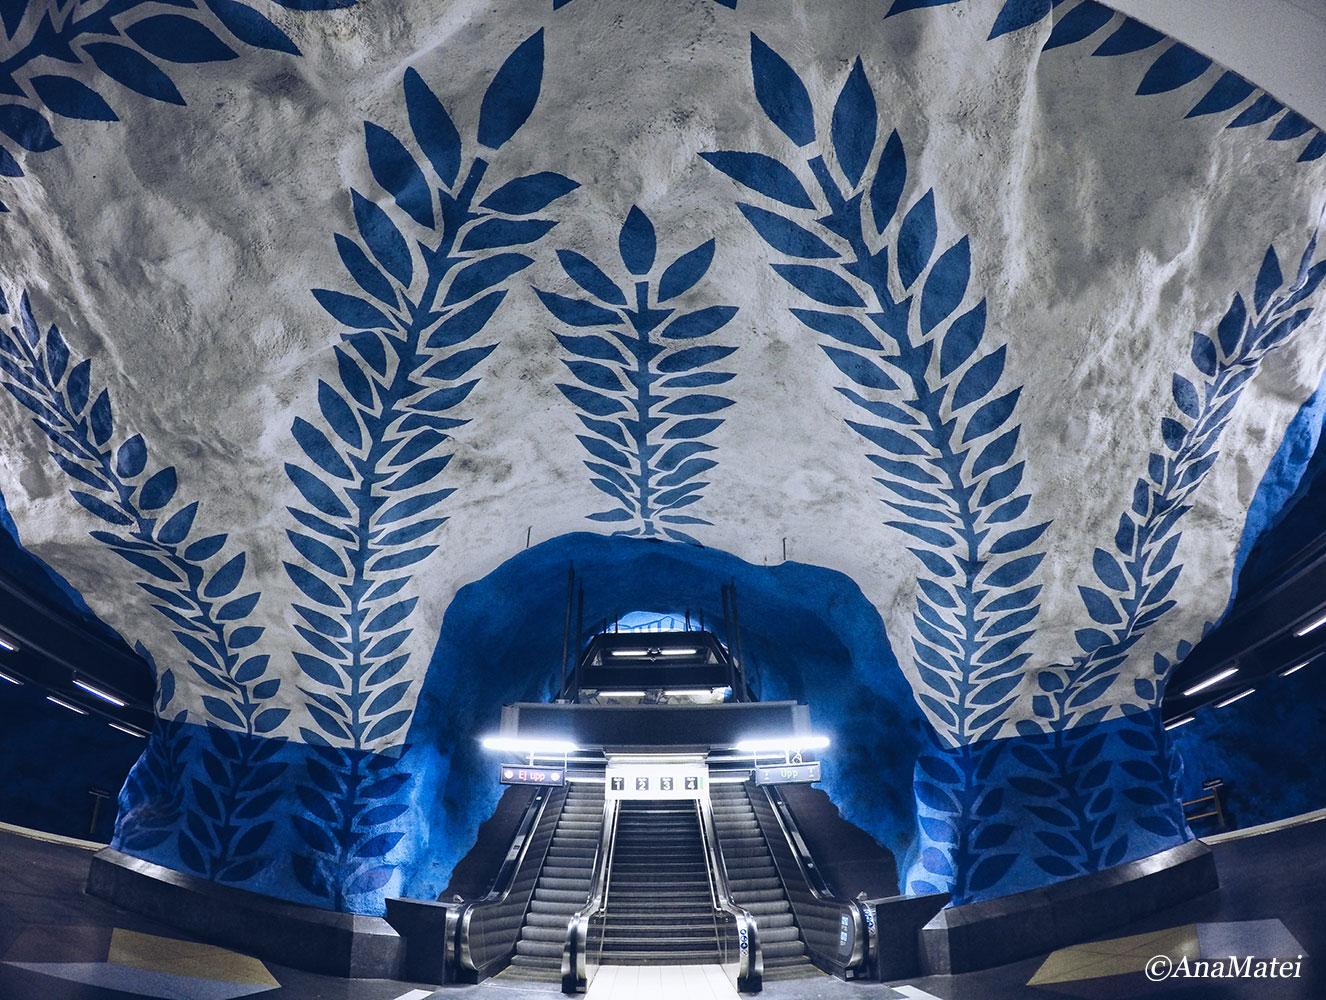 tunnelbana-stockholm-subway